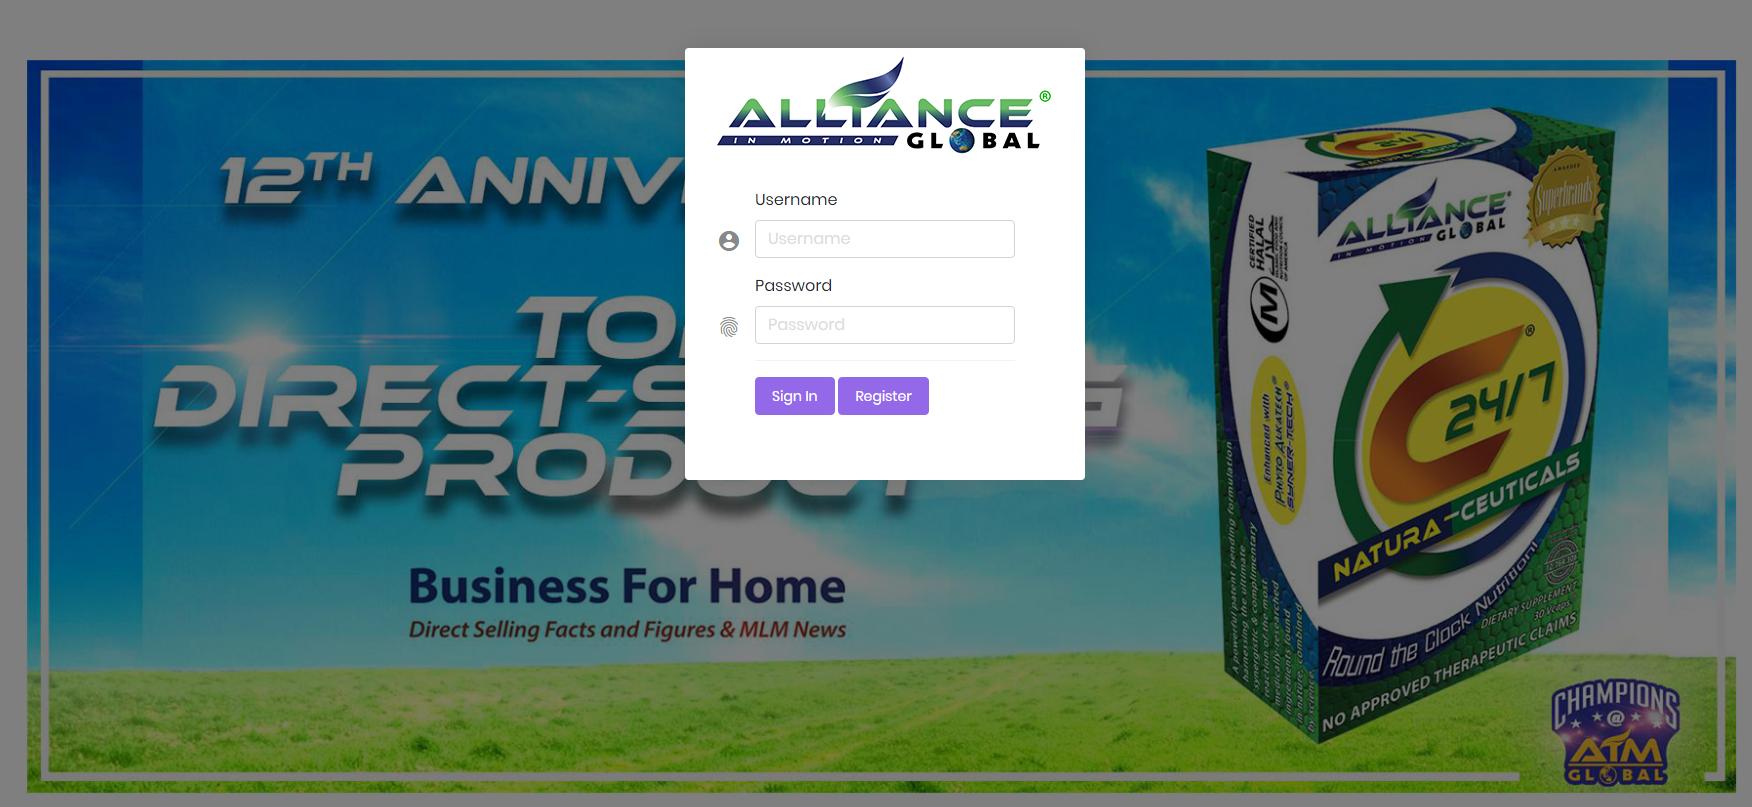 Aim global clipart dtc svg AIMGLOBAL FIJI BUSINESS PRESENTATION – AIMGLOBAL BUSINESS PRESENTATION svg